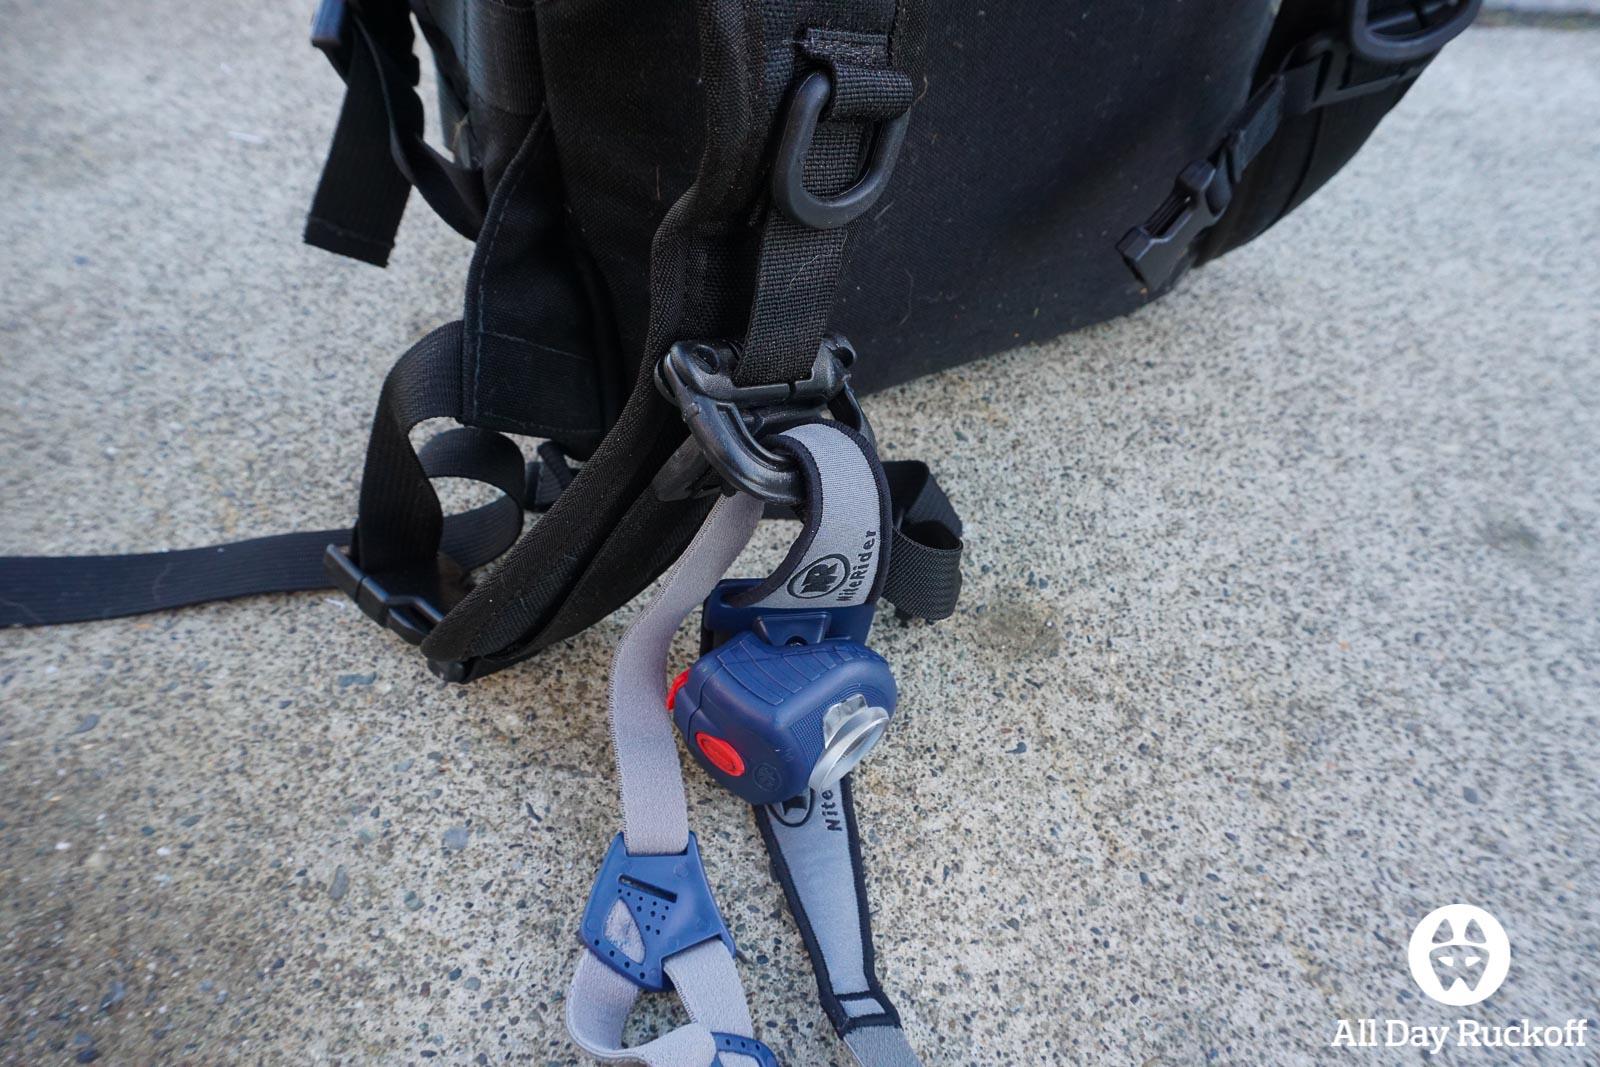 NiteRider Adventure 180 - Locked In